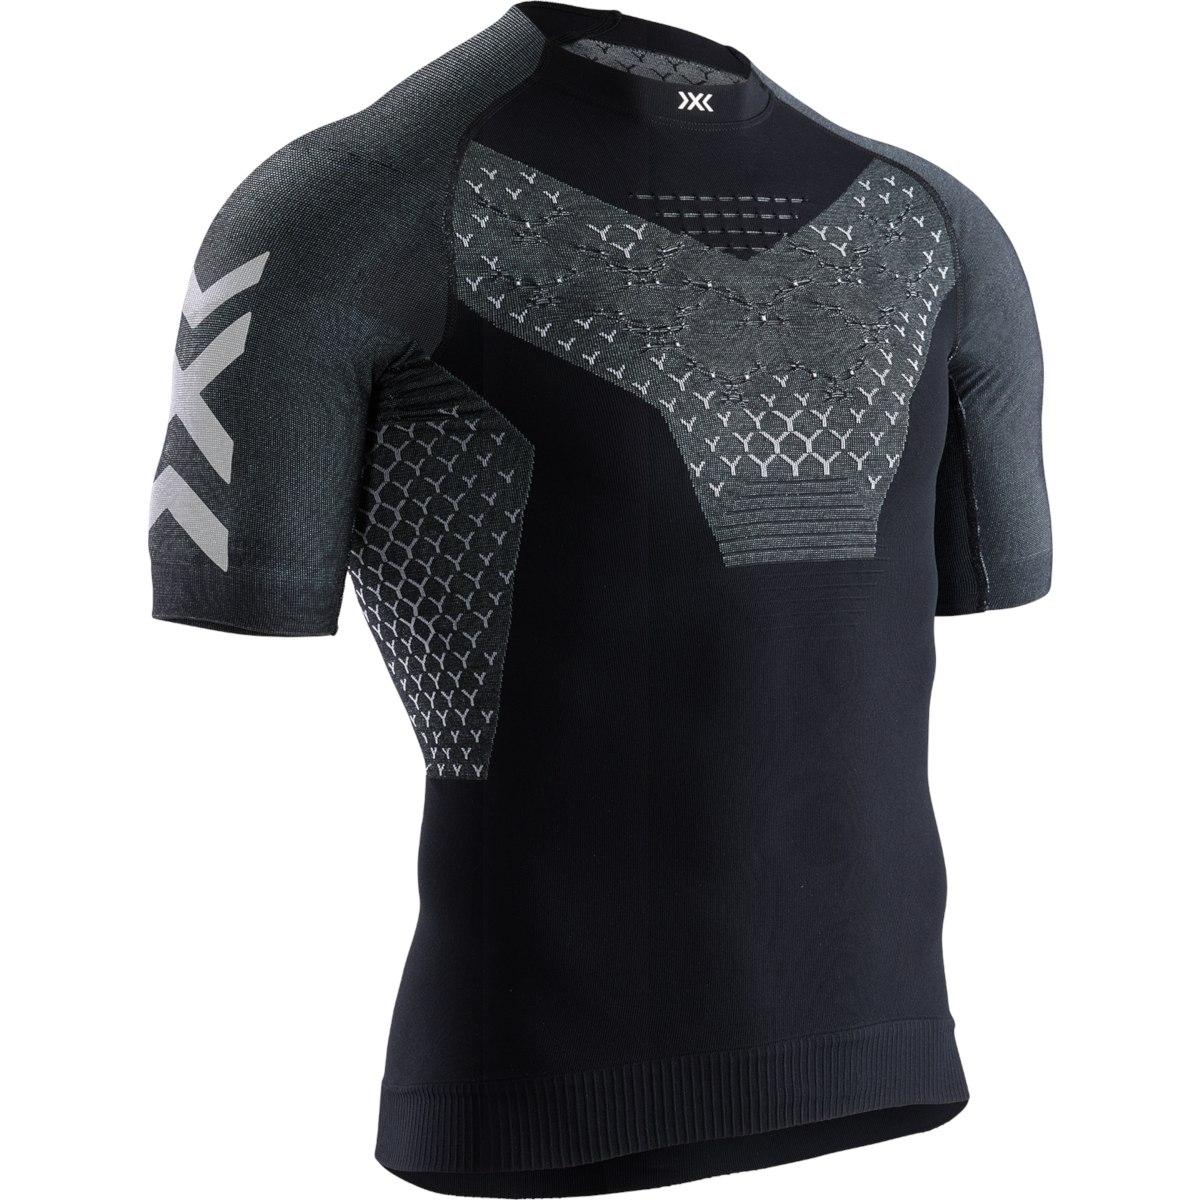 X-Bionic TWYCE 4.0 Run Shirt Short Sleeves for Men - opal black/arctic white